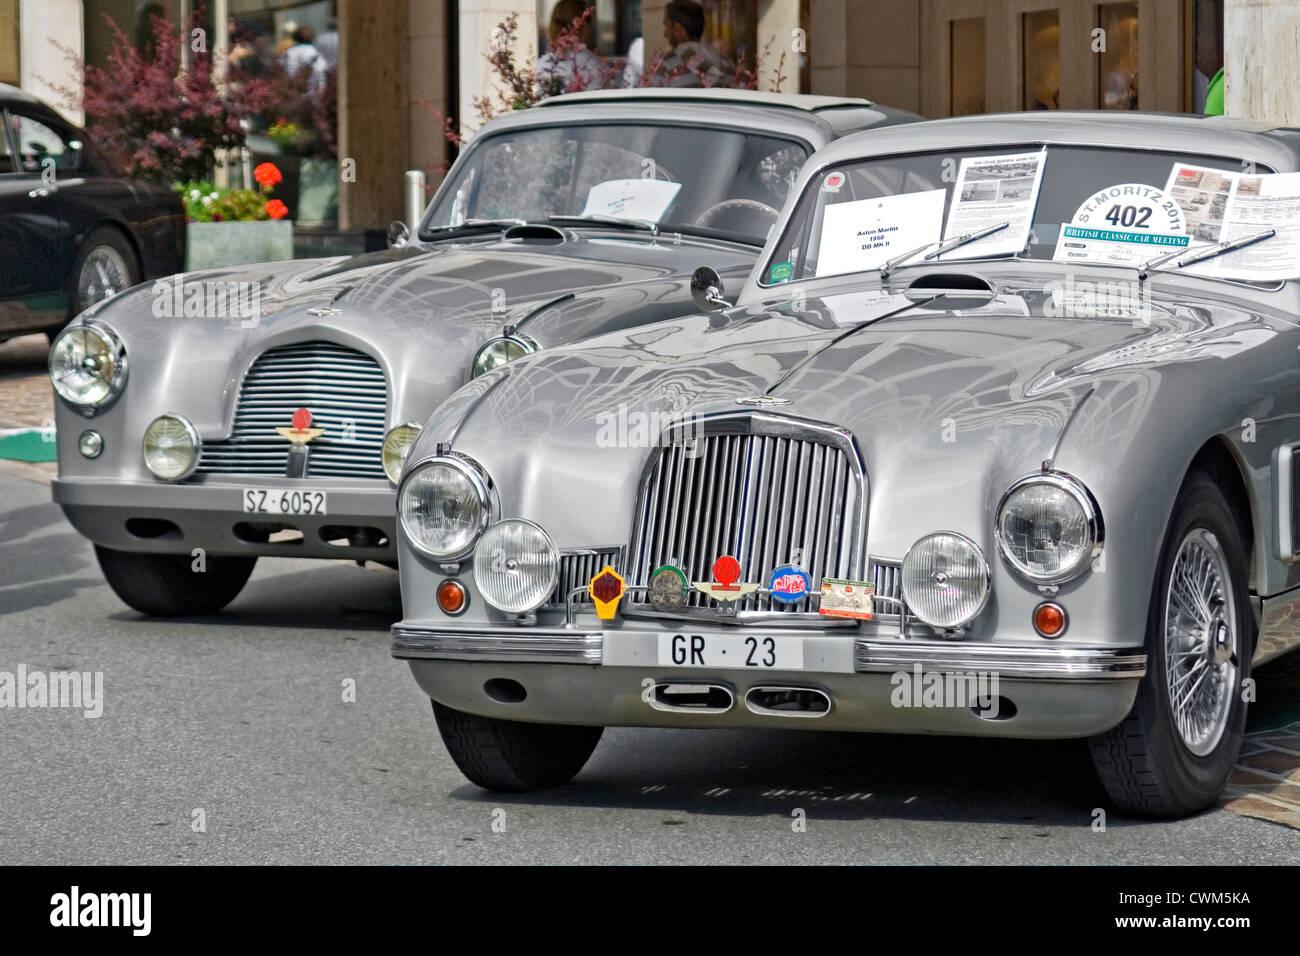 Aston Martin db mk 2 closeup during St Moritz British Classic Car Meeting, Switzerland - Stock Image